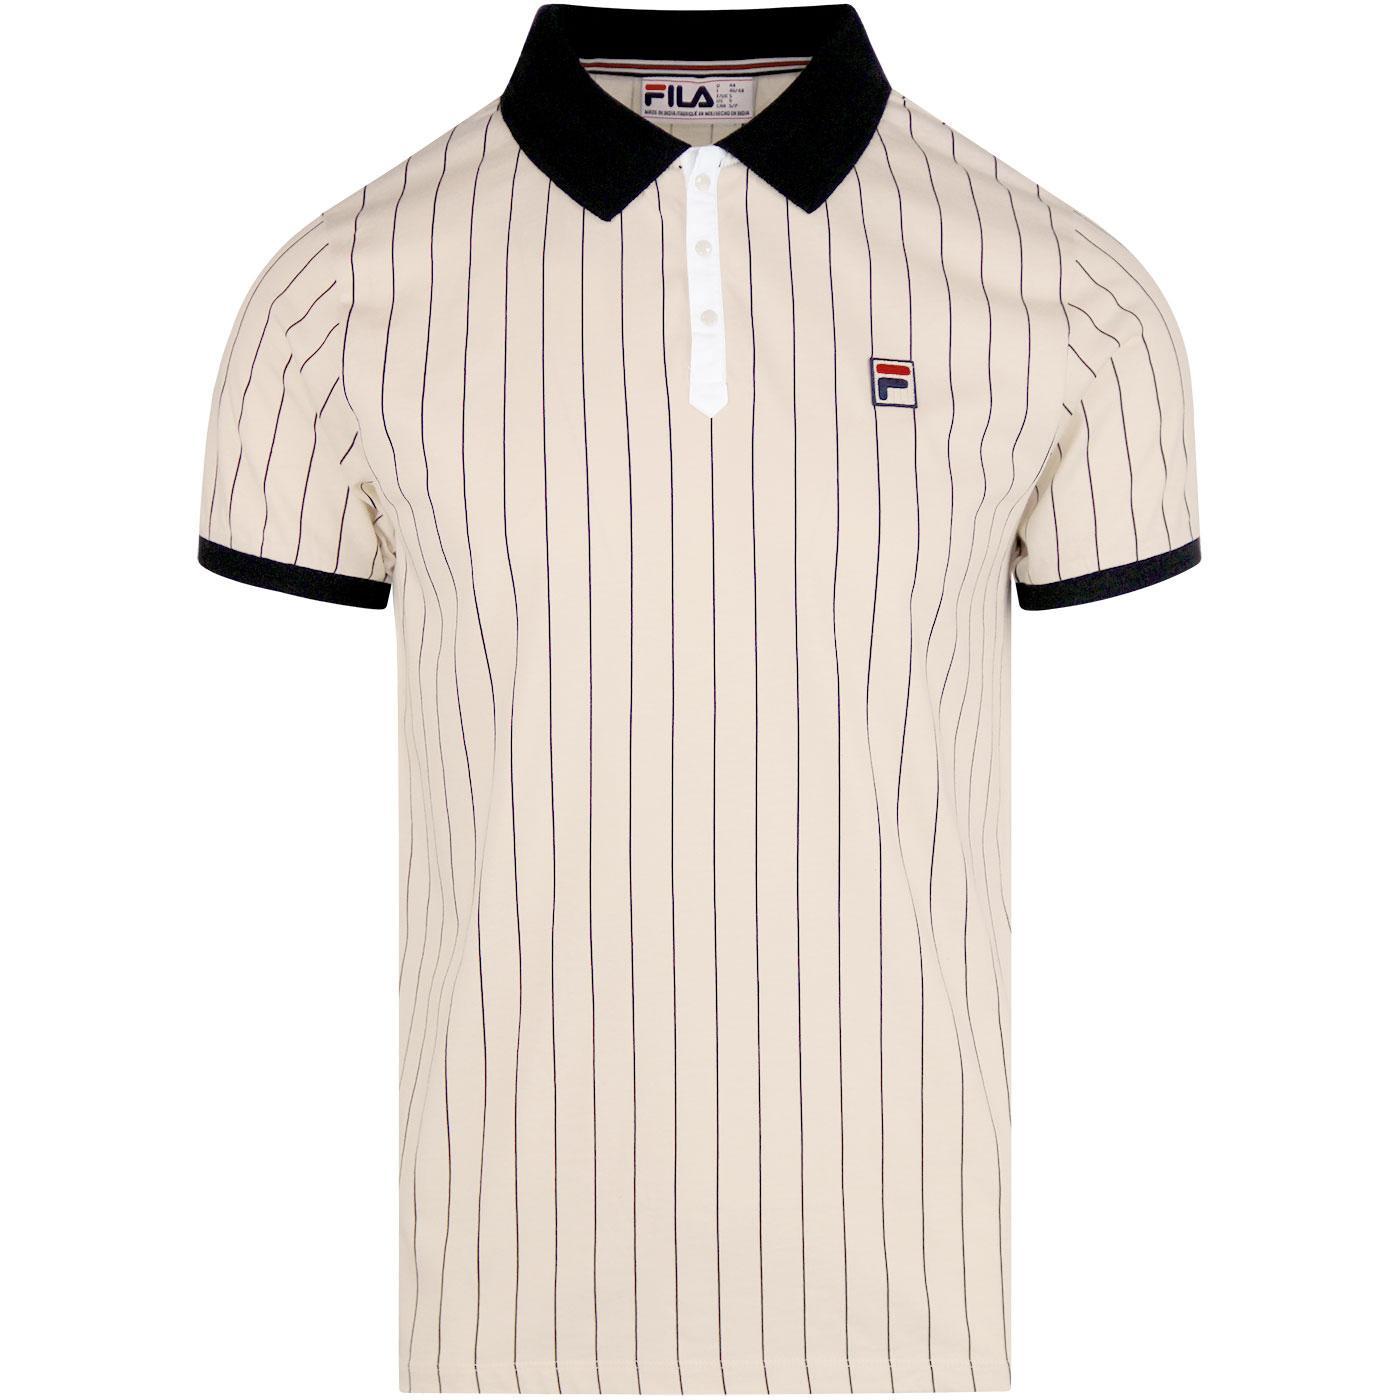 4fb38eb8c6a4e FILA VINTAGE BB1 Retro 70s Tennis Polo Shirt in Sand Dollar